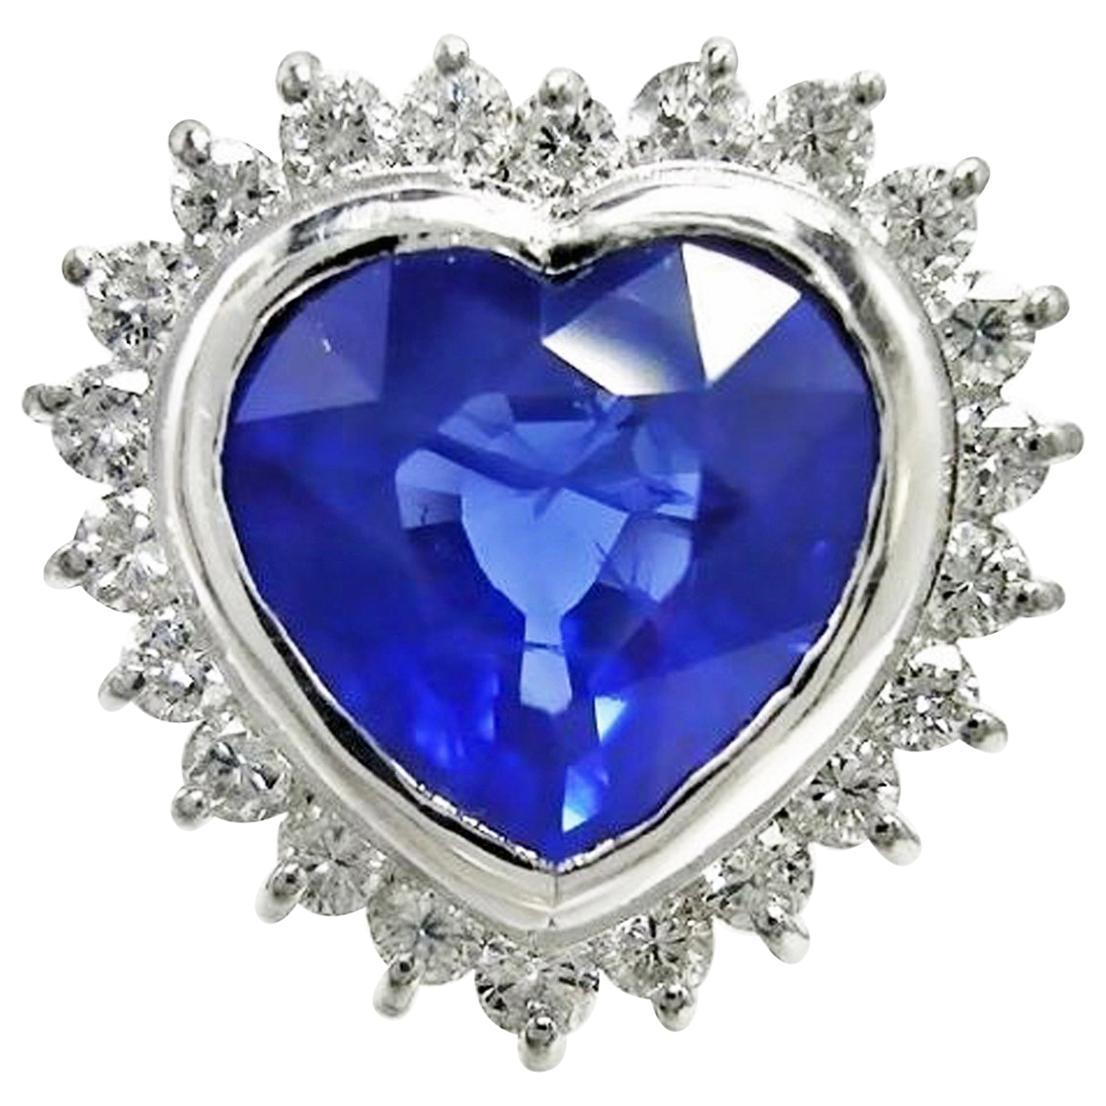 6.35 Carat Burma Heart Sapphire Diamond Engagement Ring 18K Gold /Certified